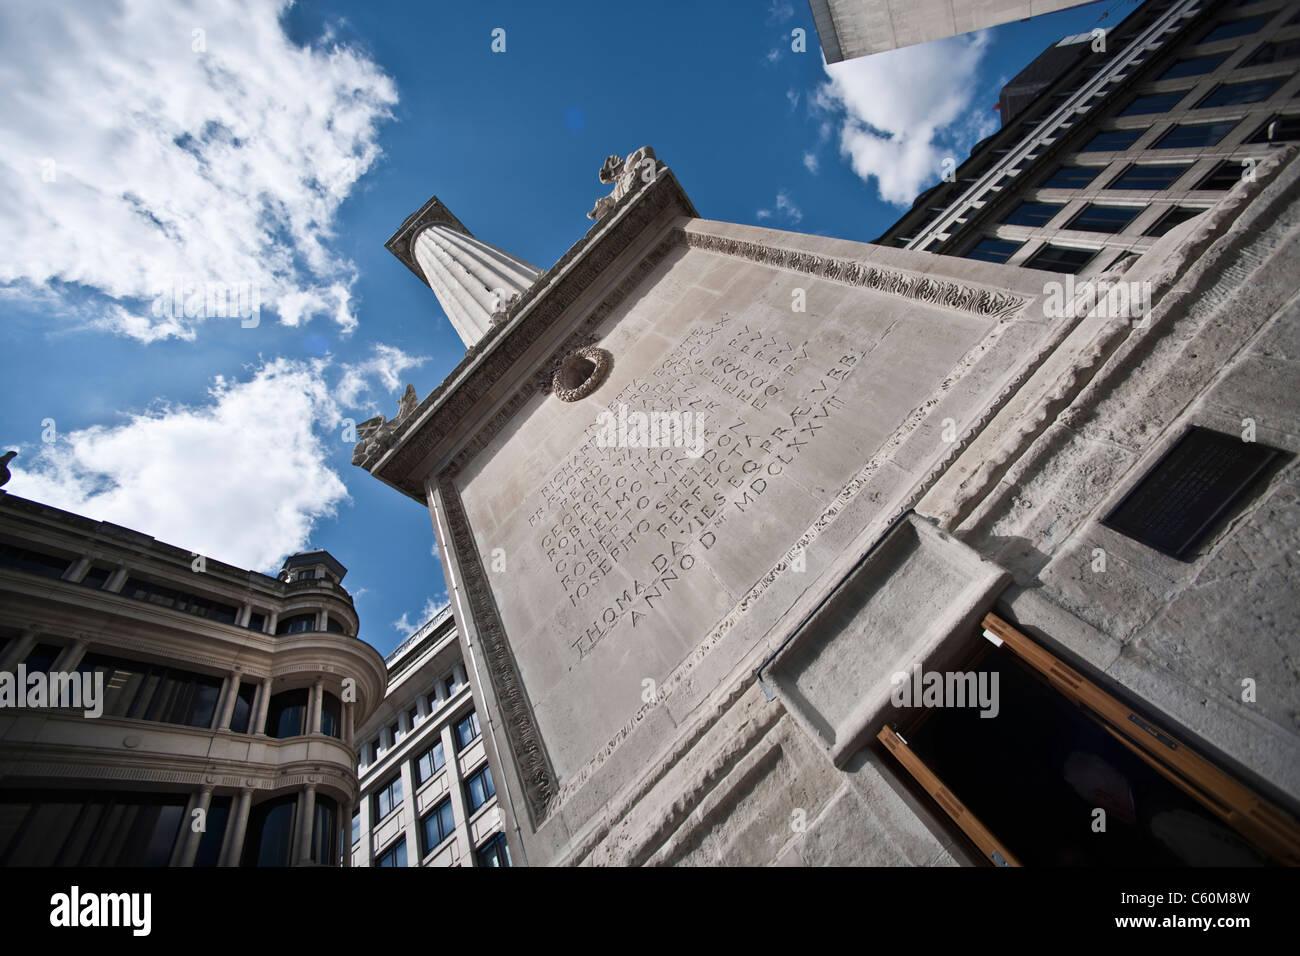 Monument on city street against blue sky Stock Photo